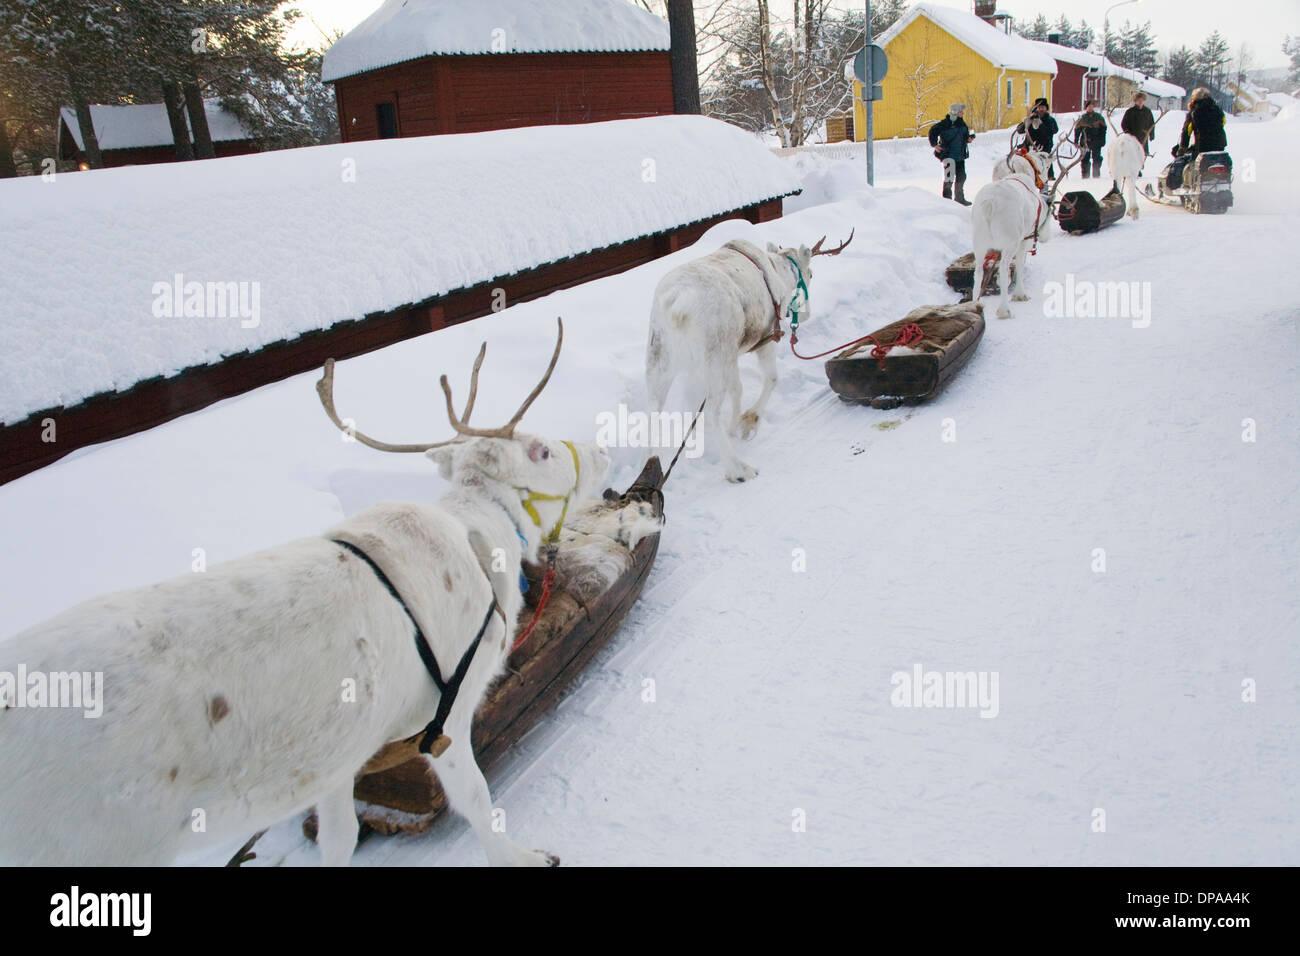 Reindeer caravan Laplander culture Jokkmokk fair Laponia Sweden - Stock Image